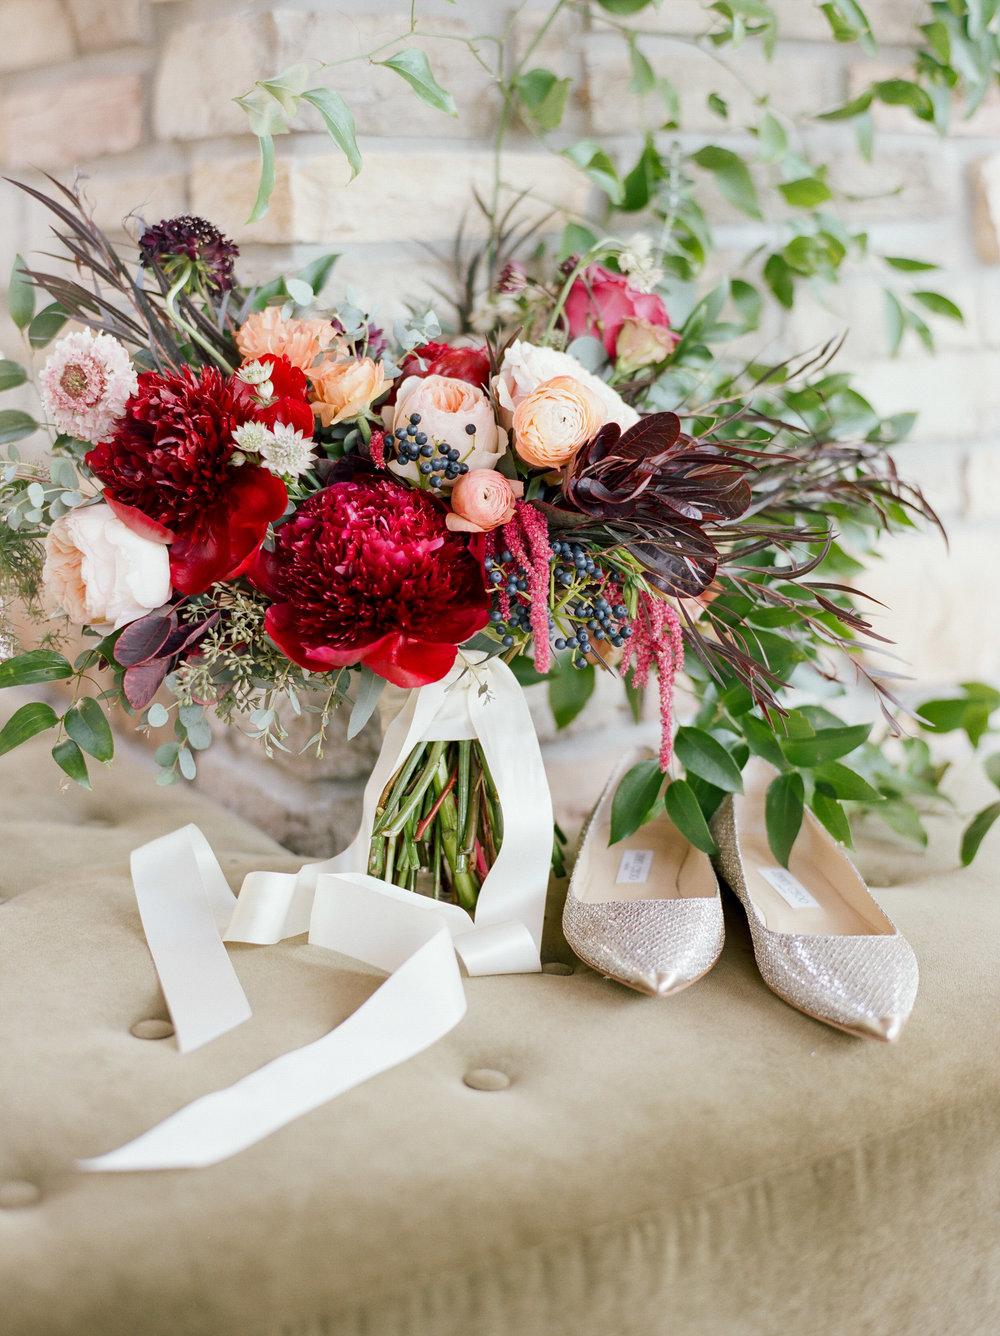 Houston-Wedding-Photographer-Fine-Art-Film-Destination-Style-Me-Pretty-Austin-Dallas-New-Orleans-Dana-Fernandez-Photography-The Woodlands-Country-Club-2.jpg